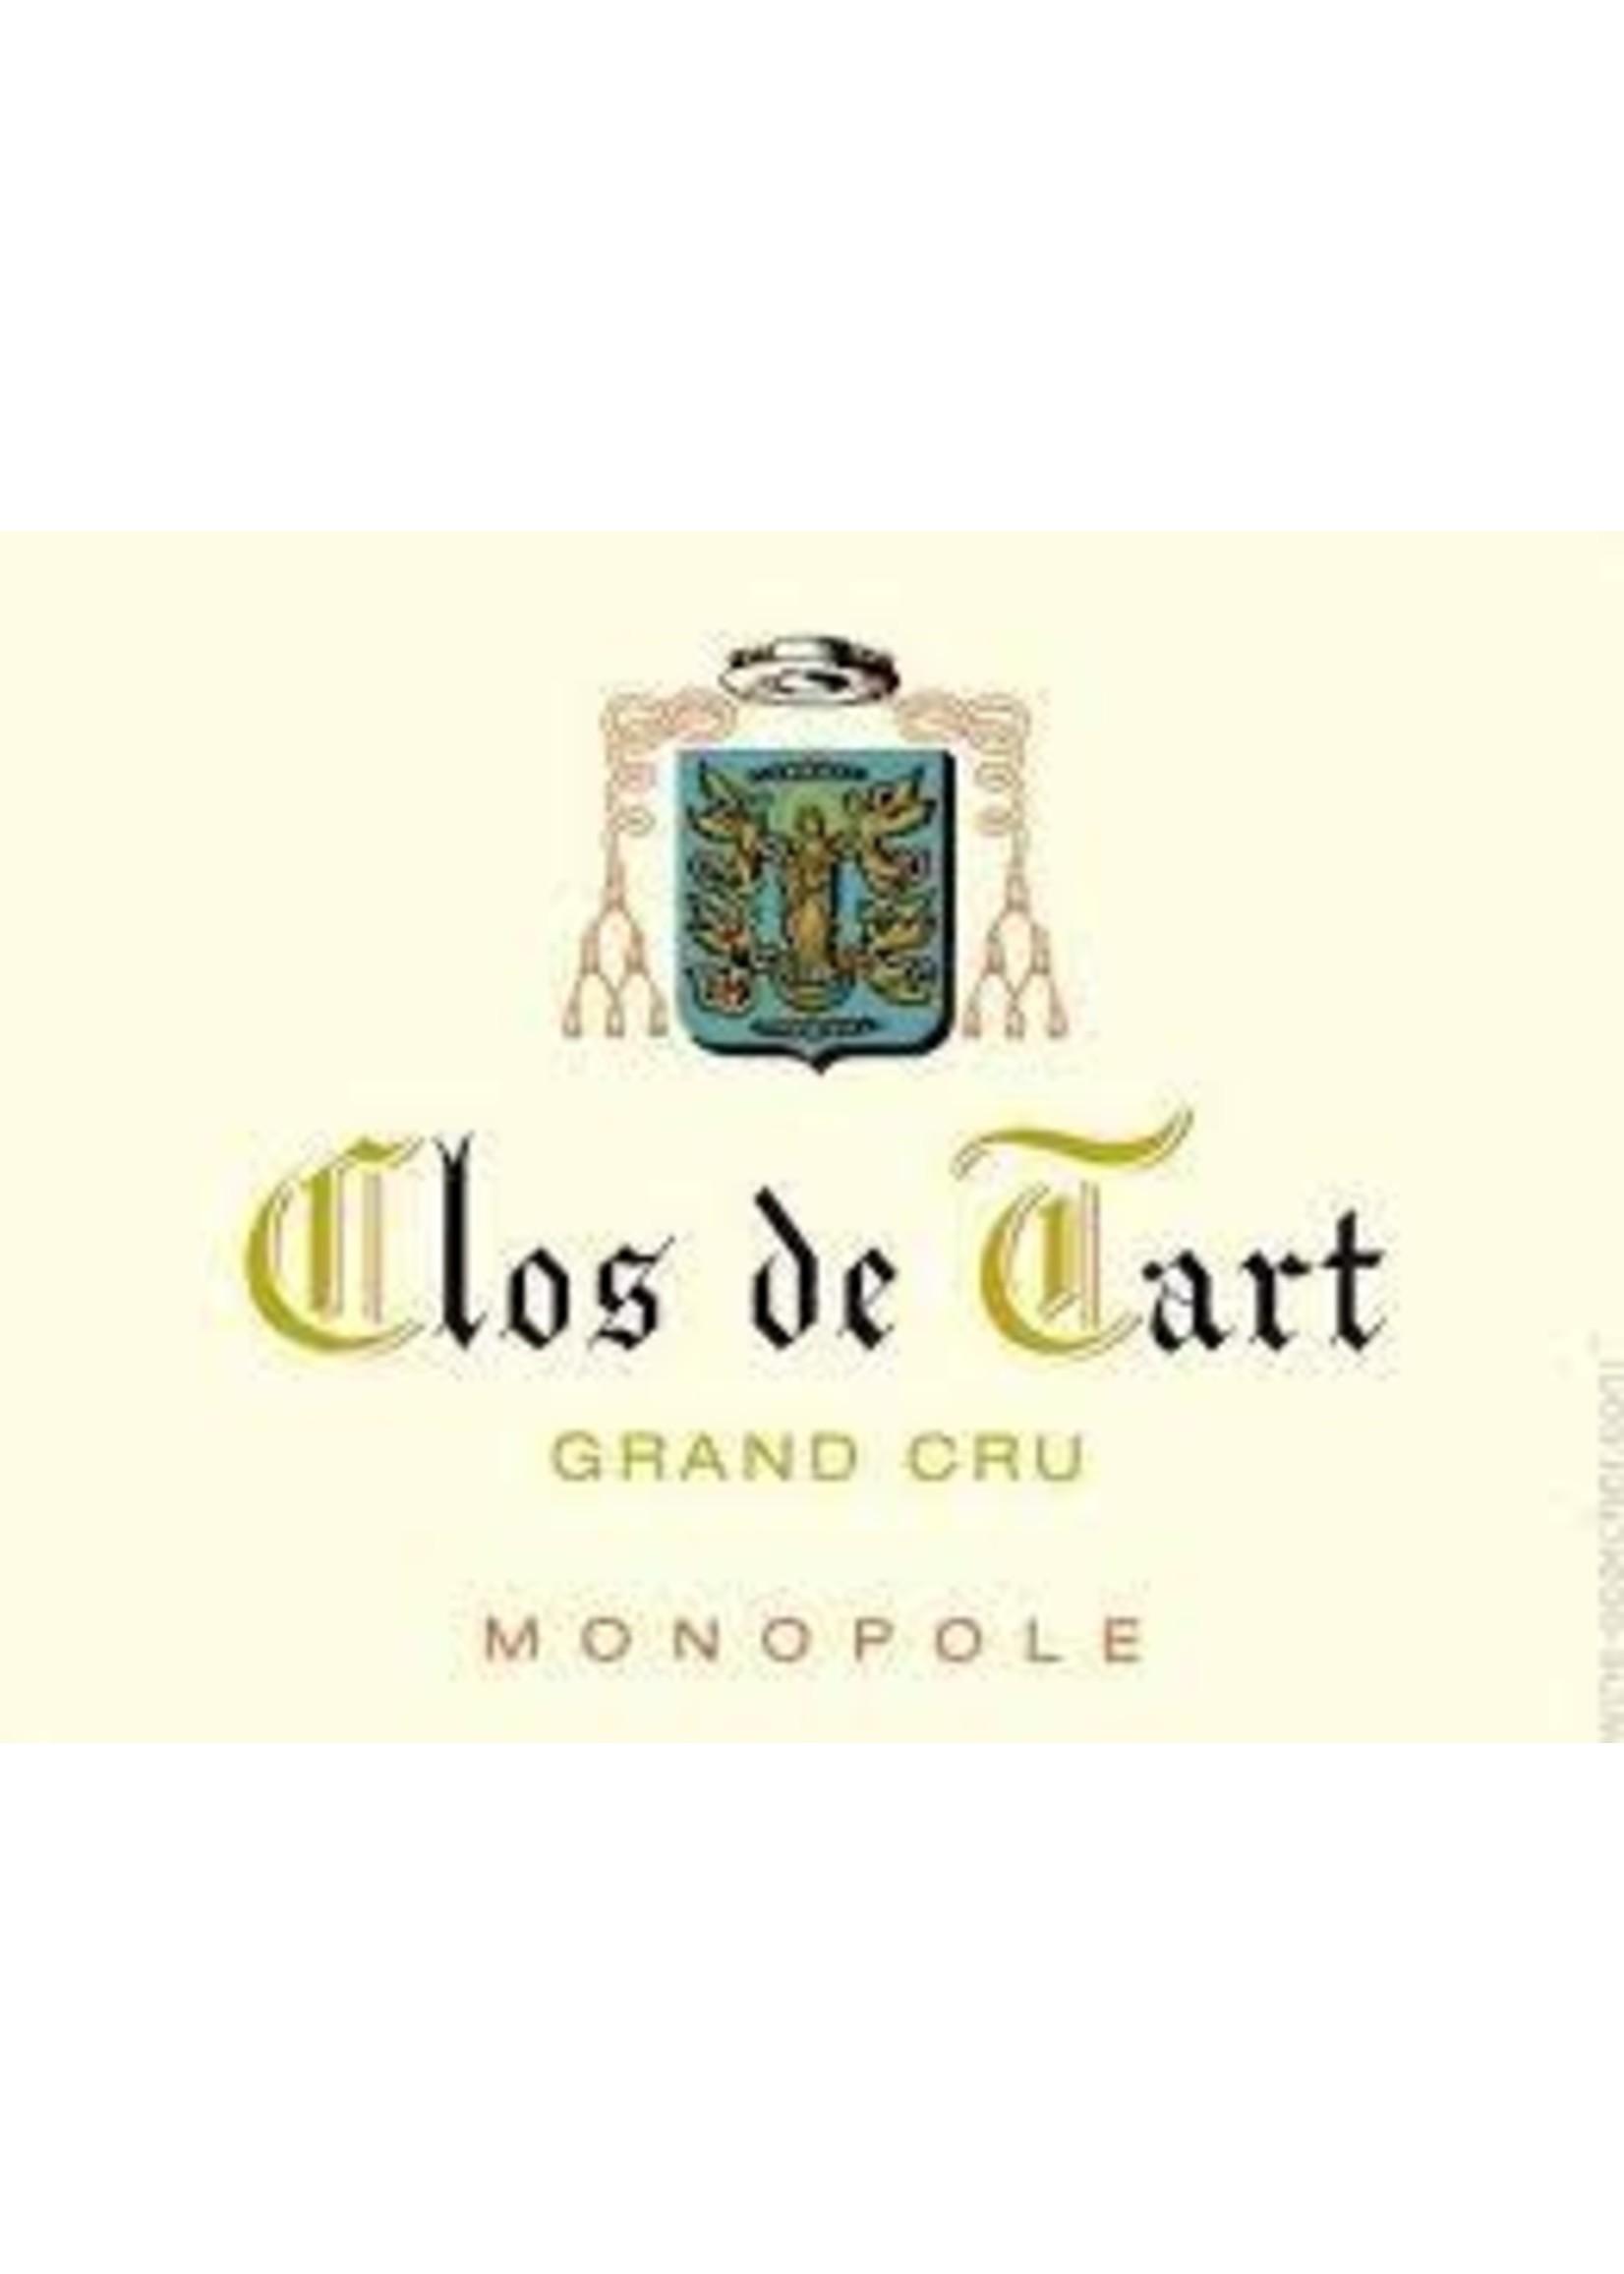 Domaine du Clos de Tart 2015 Clos de Tart Grand Cru Monopole 750ml [PRE-ARRIVAL]